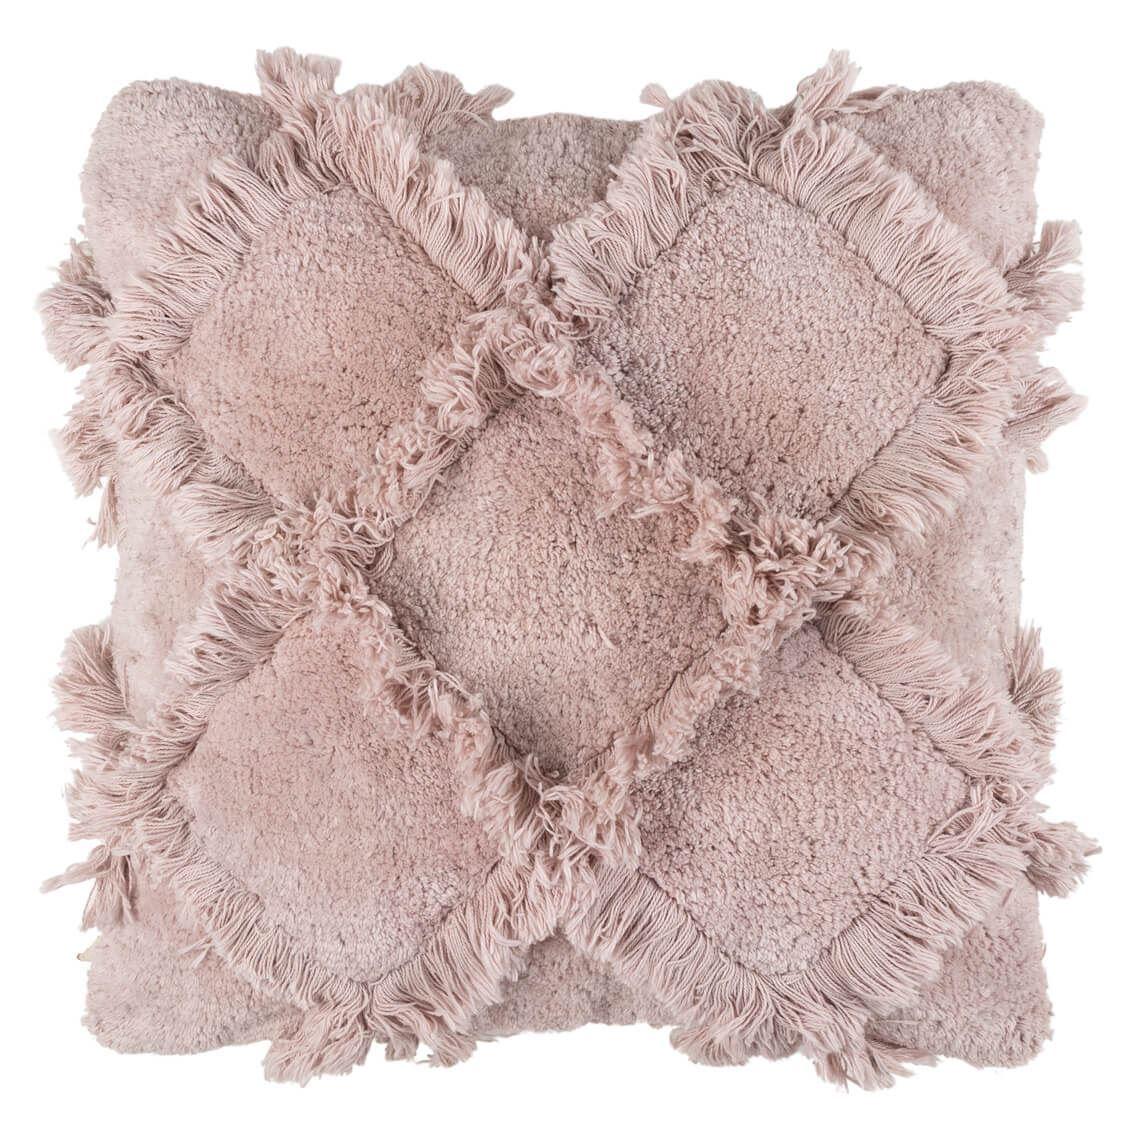 Daou Cushion Size W 50cm x D 50cm x H 12cm in Pink Freedom